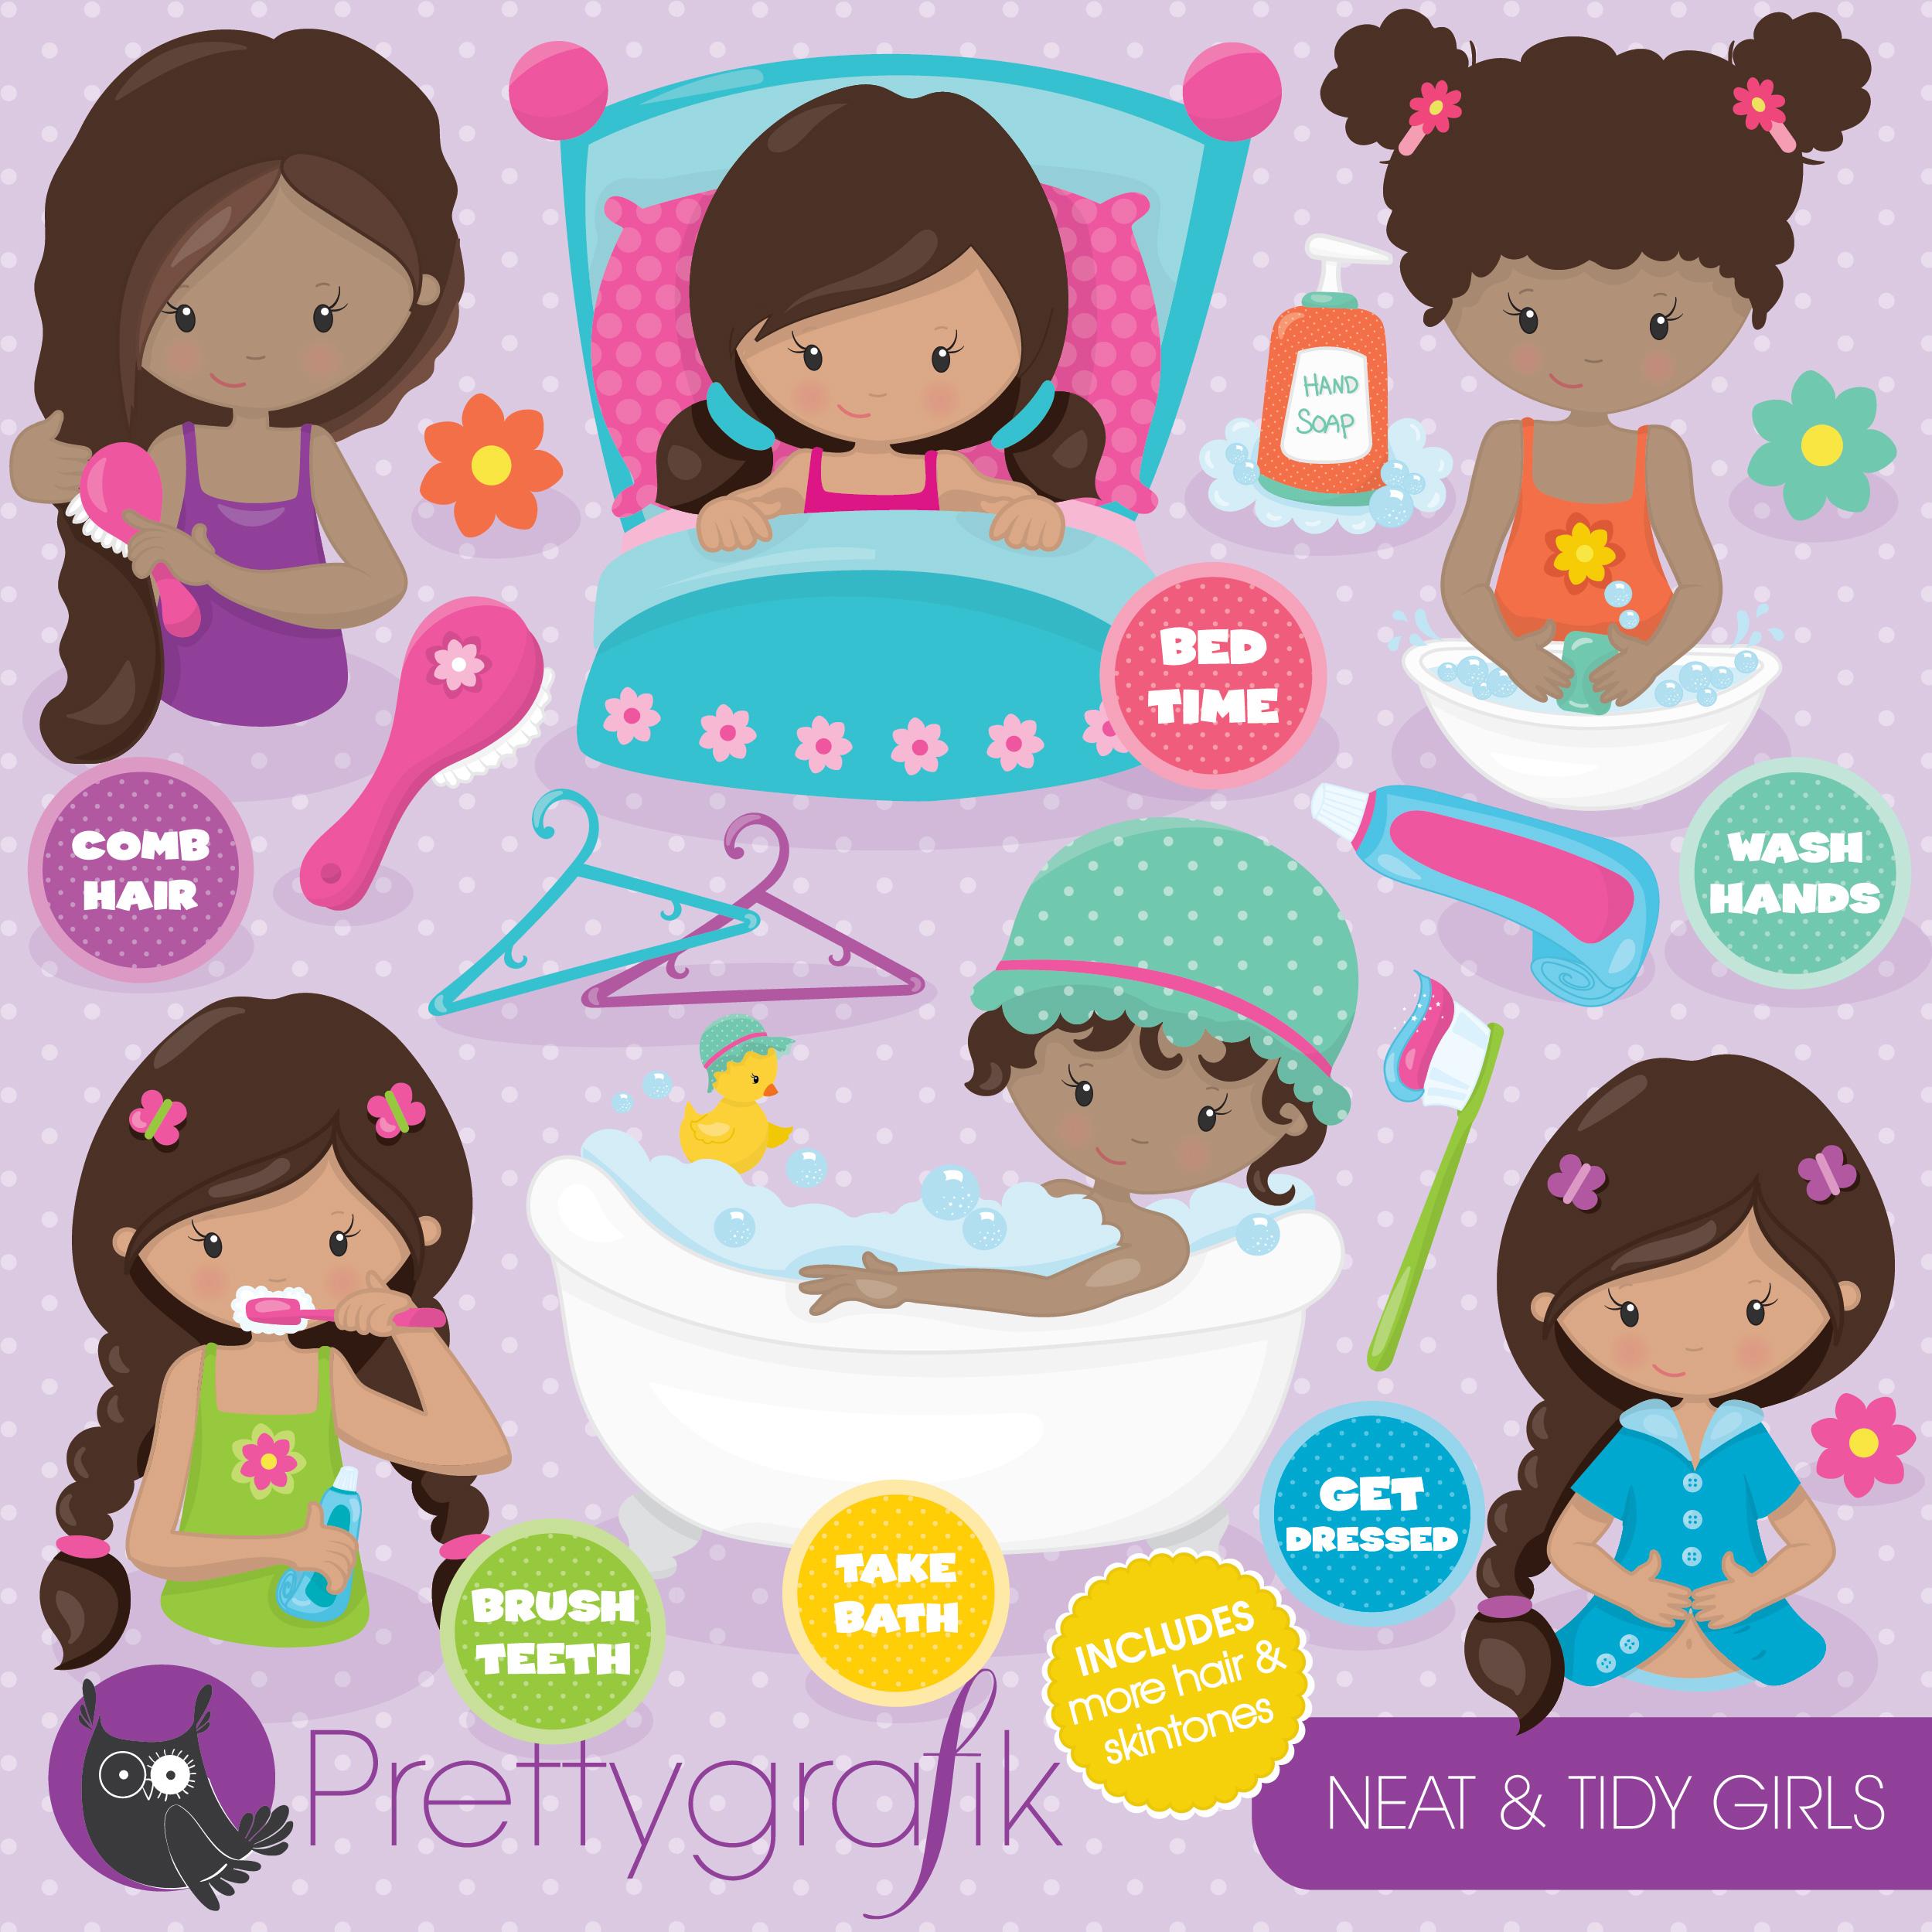 Free Hygiene Cliparts, Download Free Clip Art, Free Clip Art.